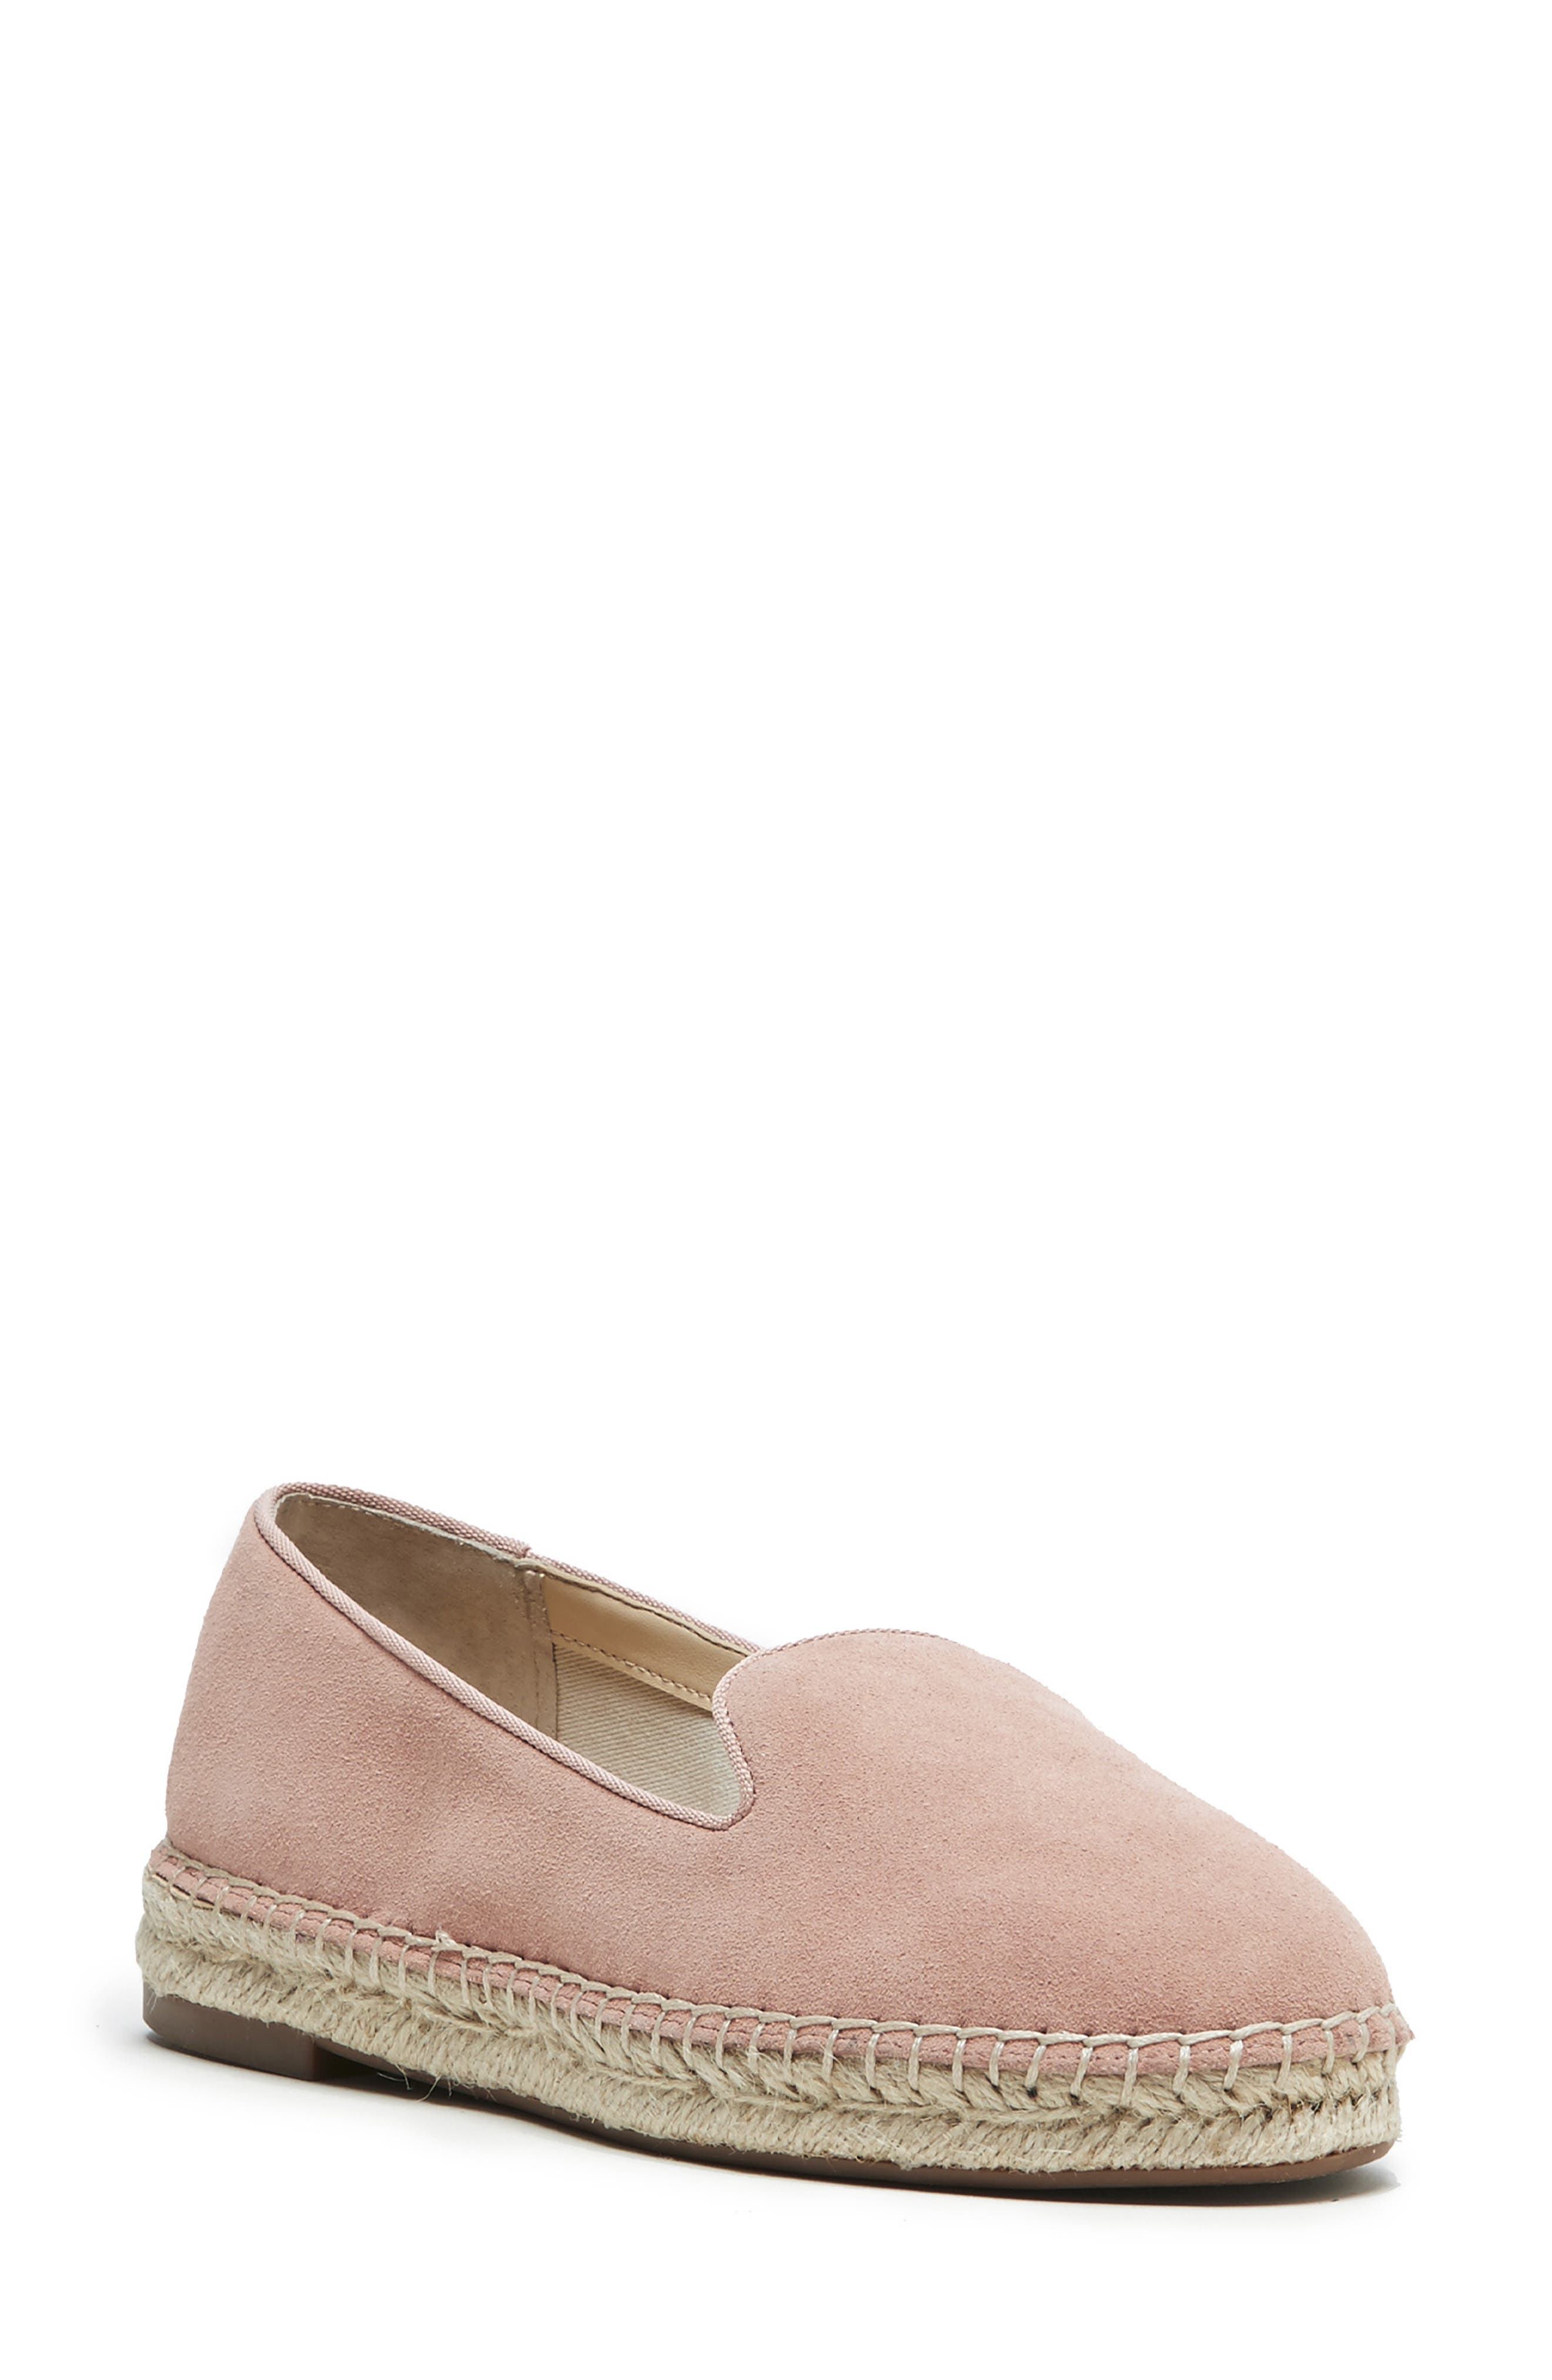 Sole Society Sammah Espadrille Loafer, Pink